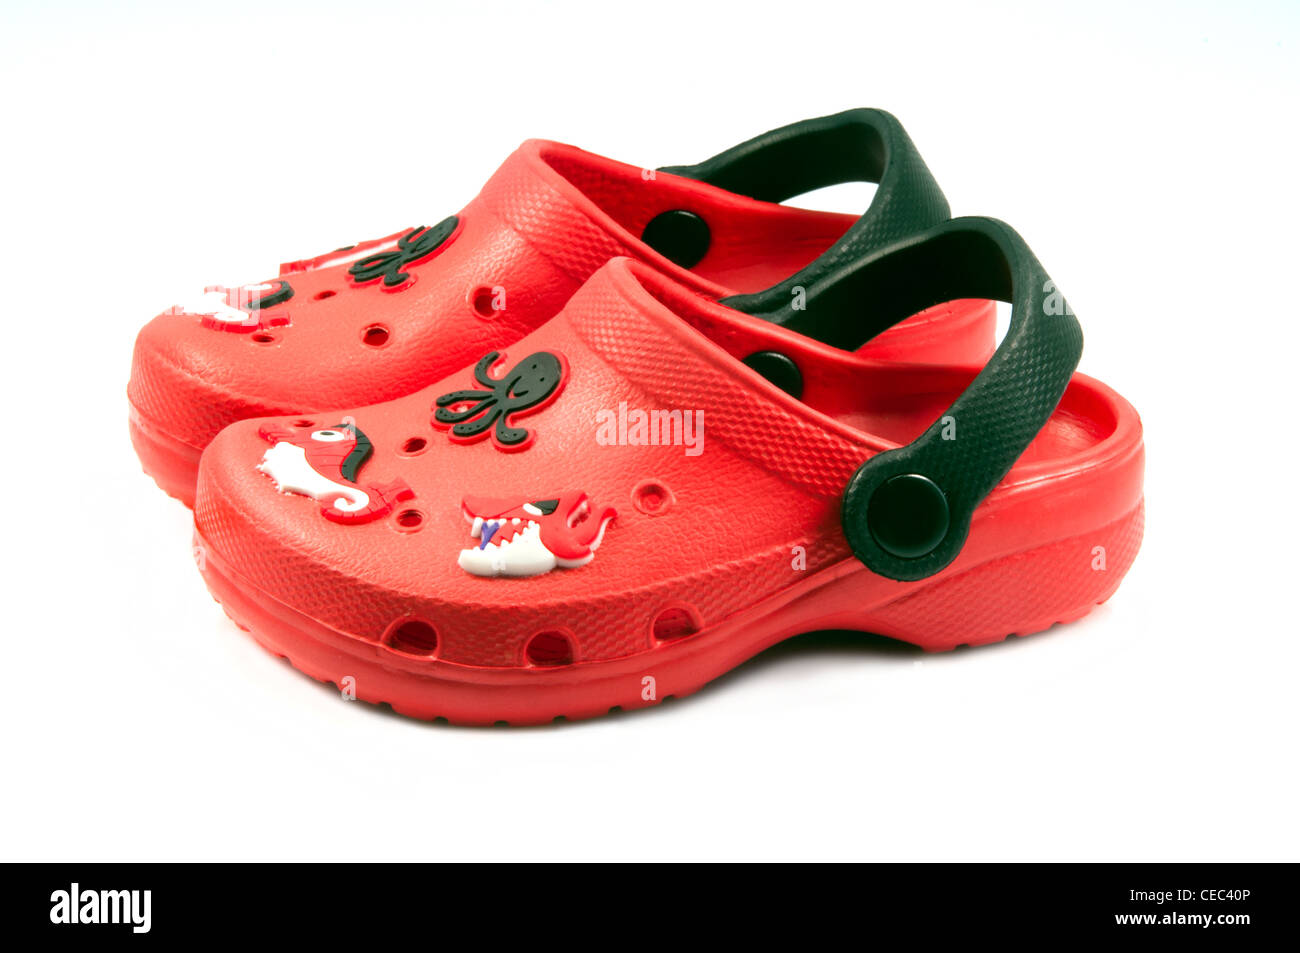 Toddler red crocs sandals - Stock Image